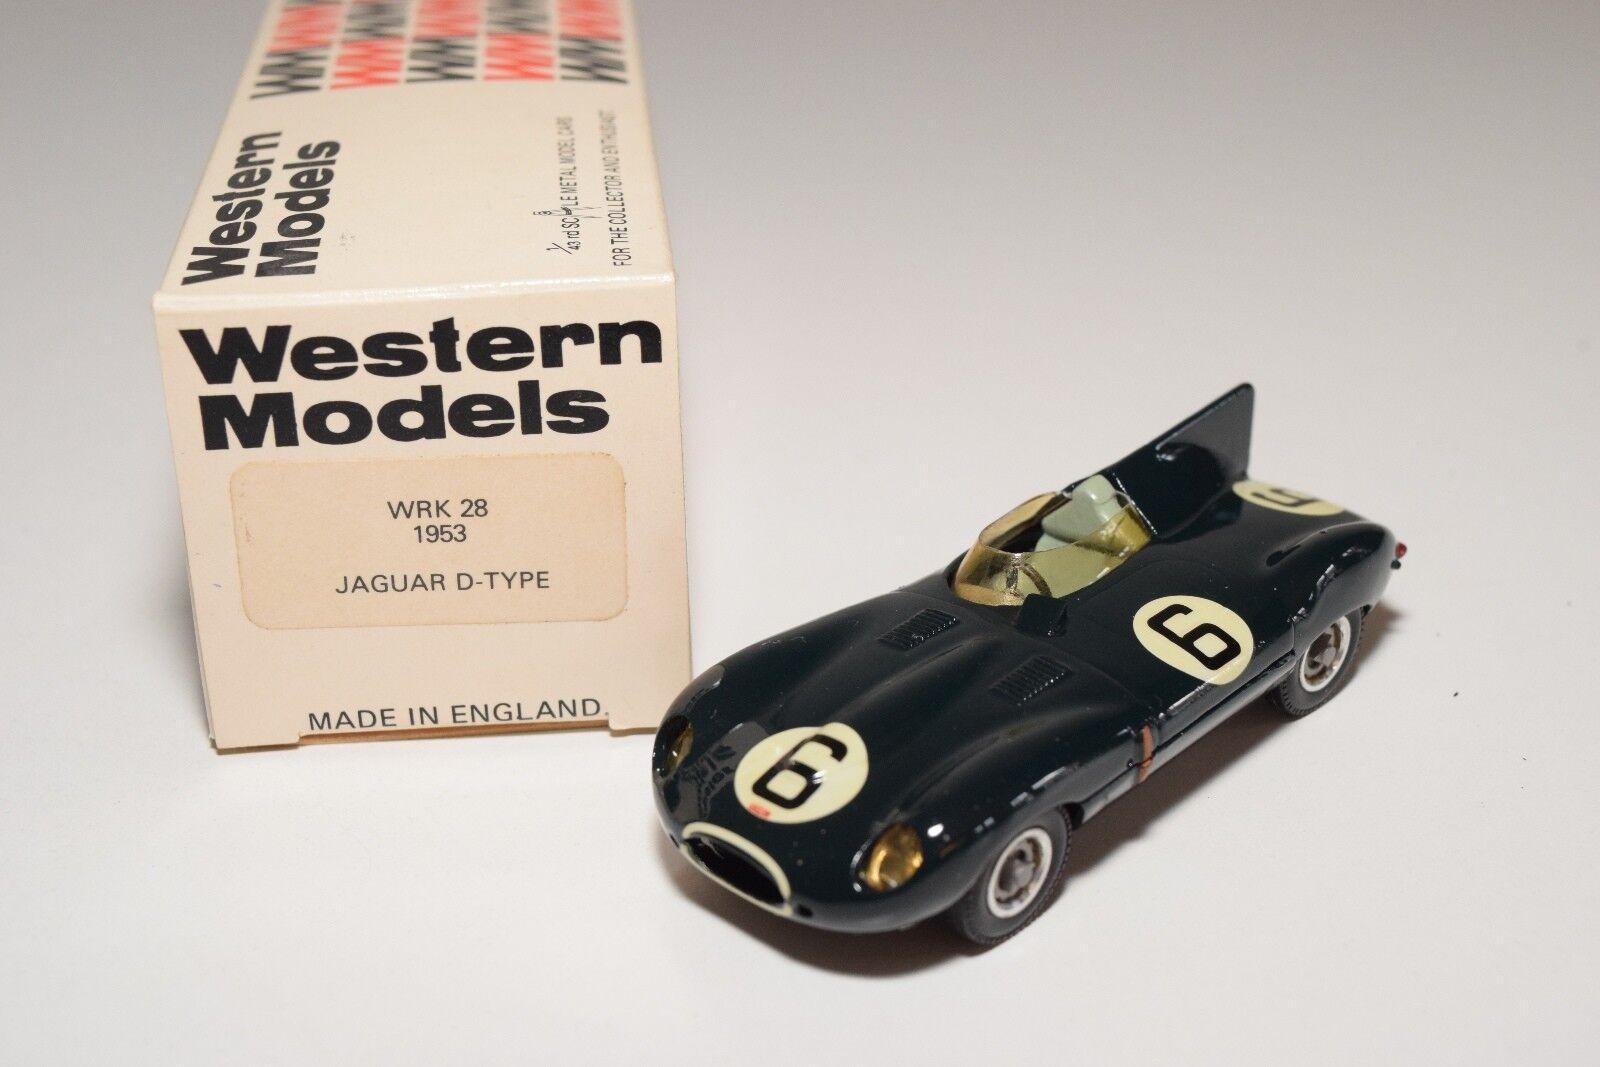 Ich westlichen modellen wm wrk 28 jaguar d-type le mans 1953 dunkelgrüne mint umzingelt